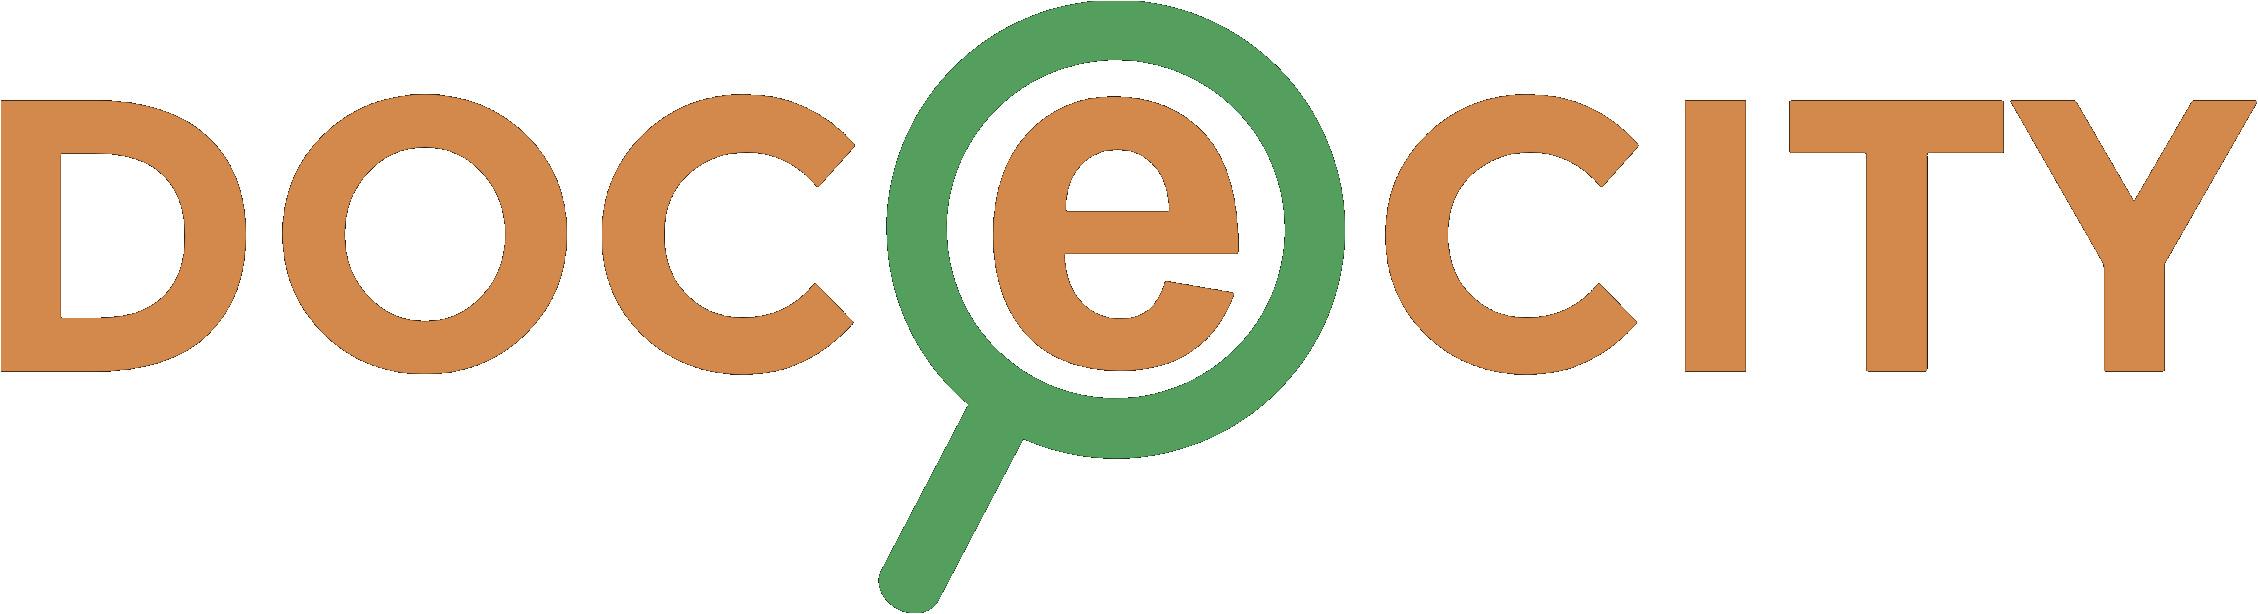 docecity logo png